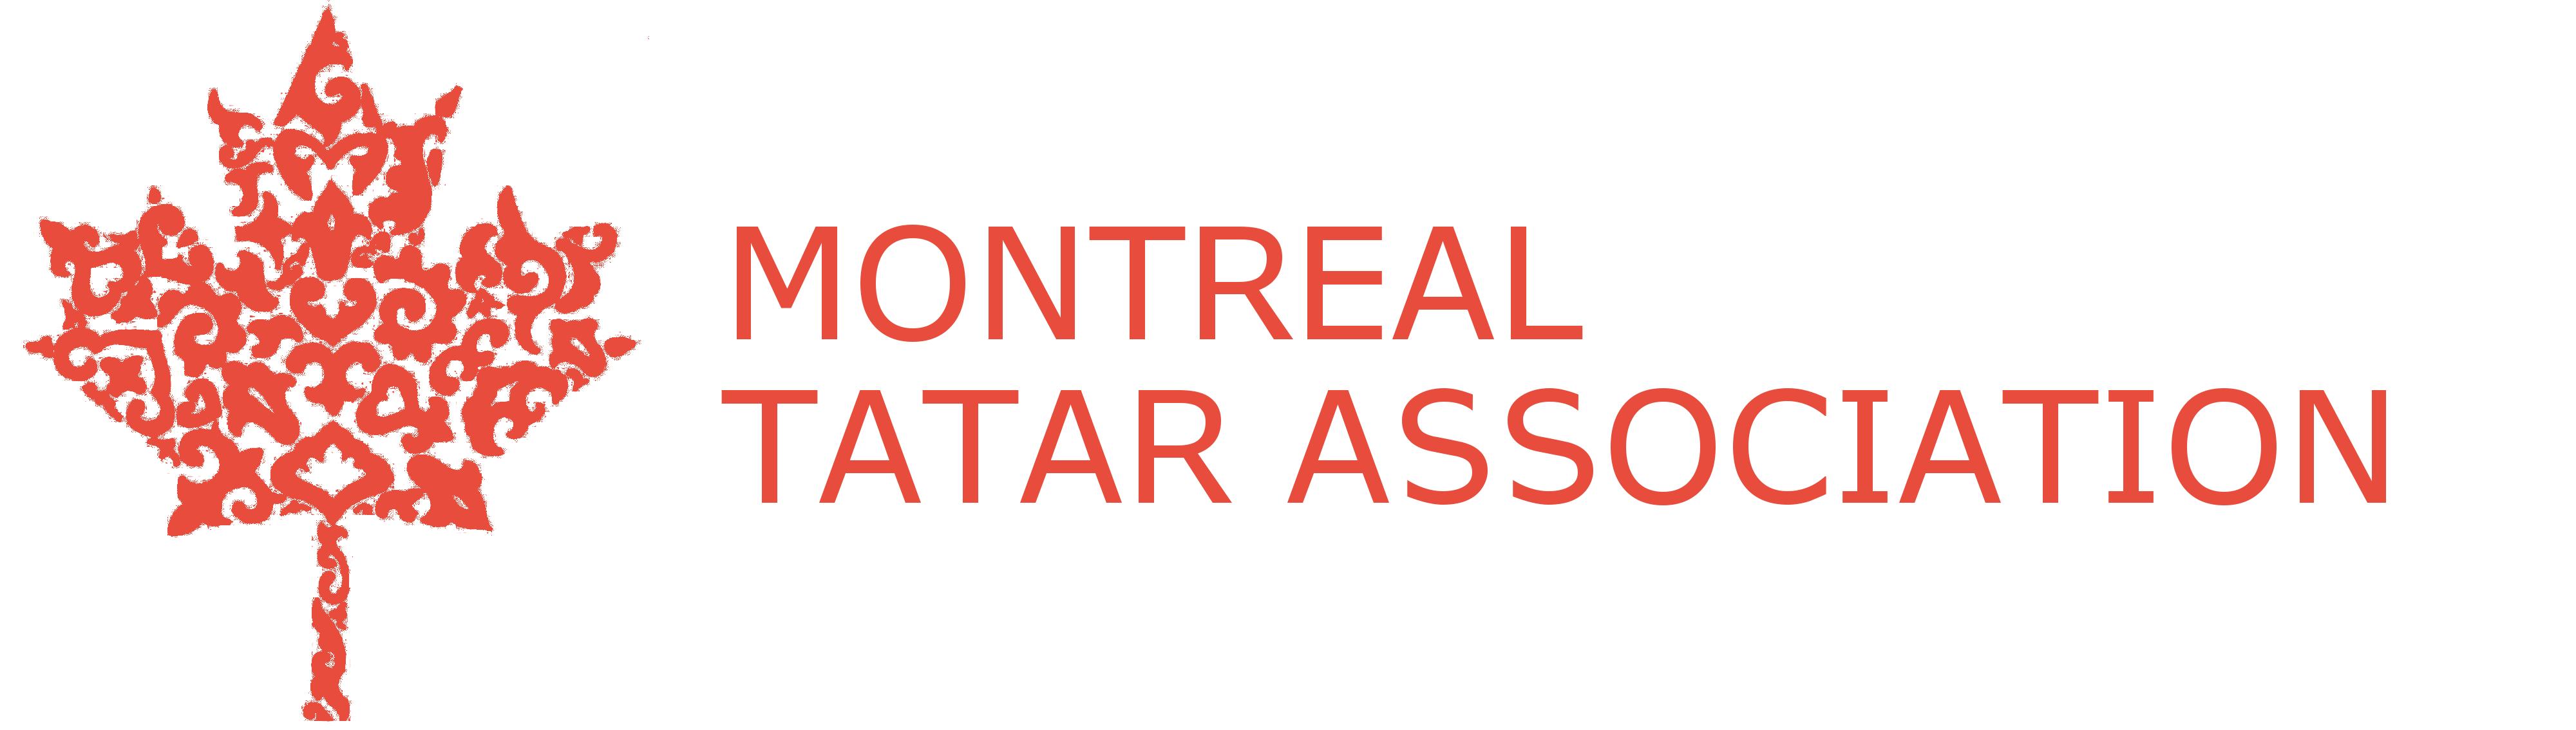 Montreal Tatar Association